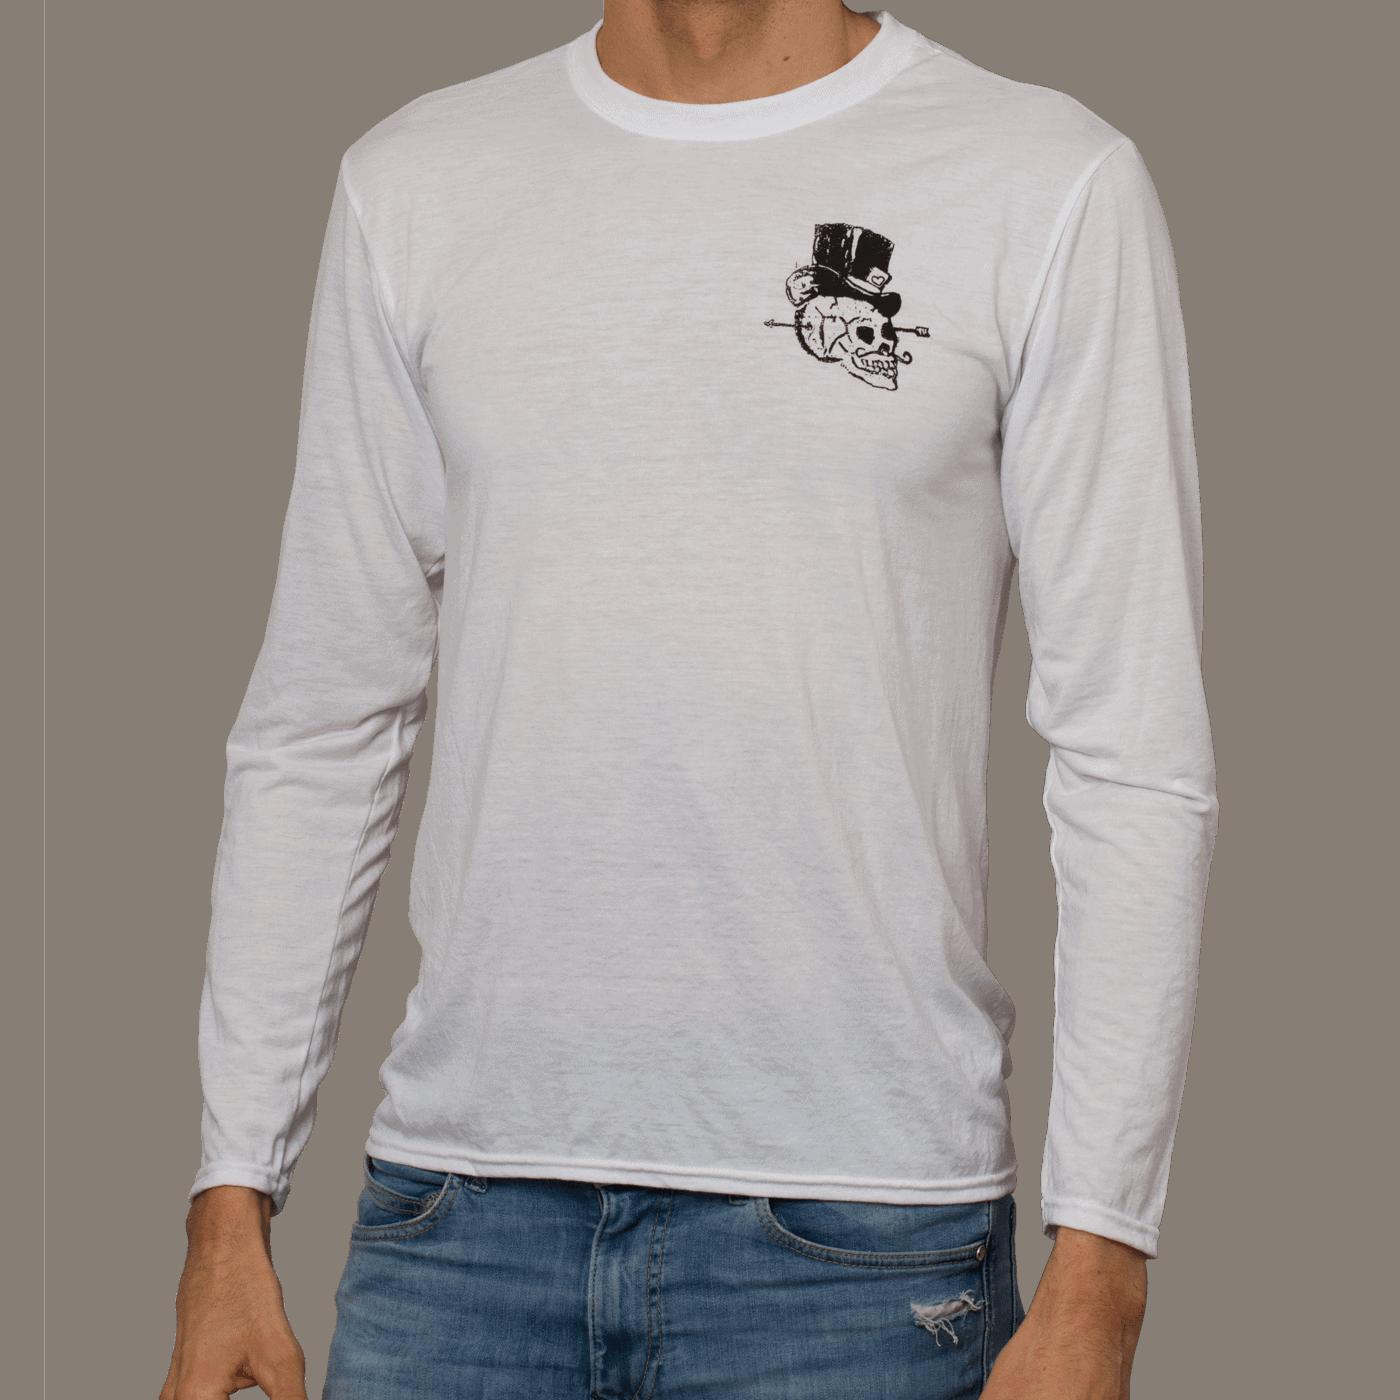 6231-Long--Sleeve-Skull-tshirt